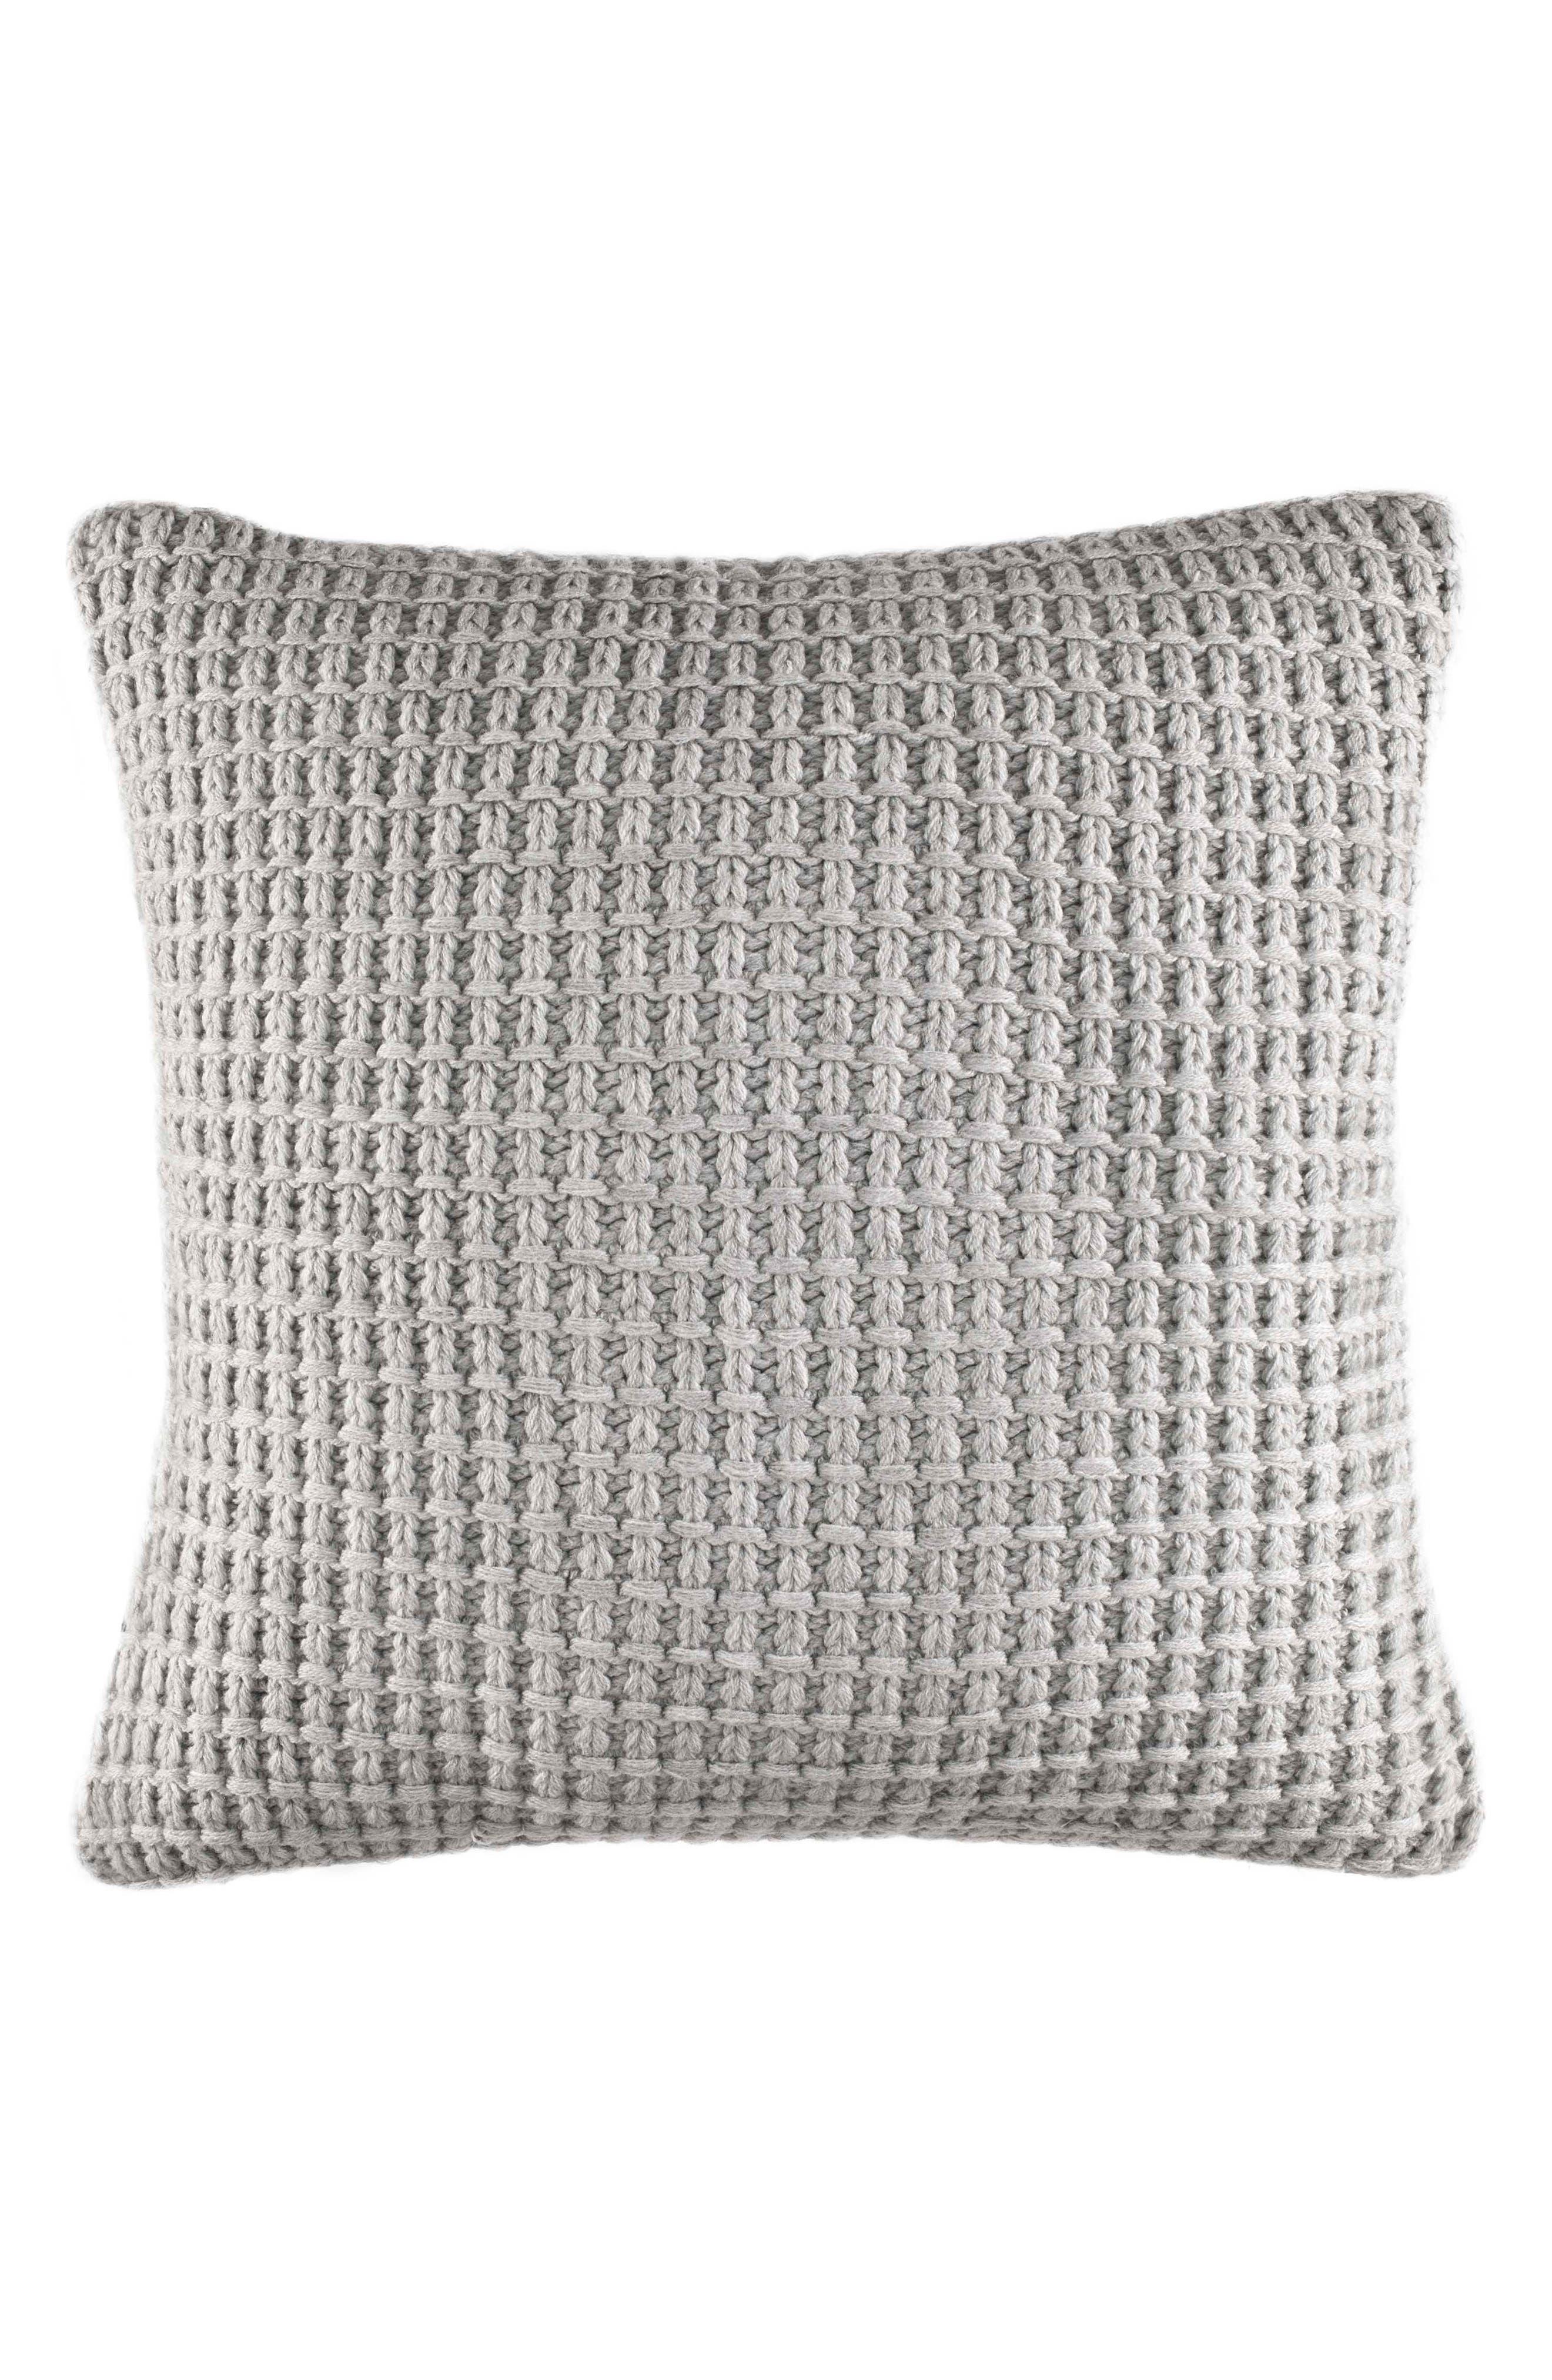 Main Image - Nautica Grey Sweater Knit Pillow